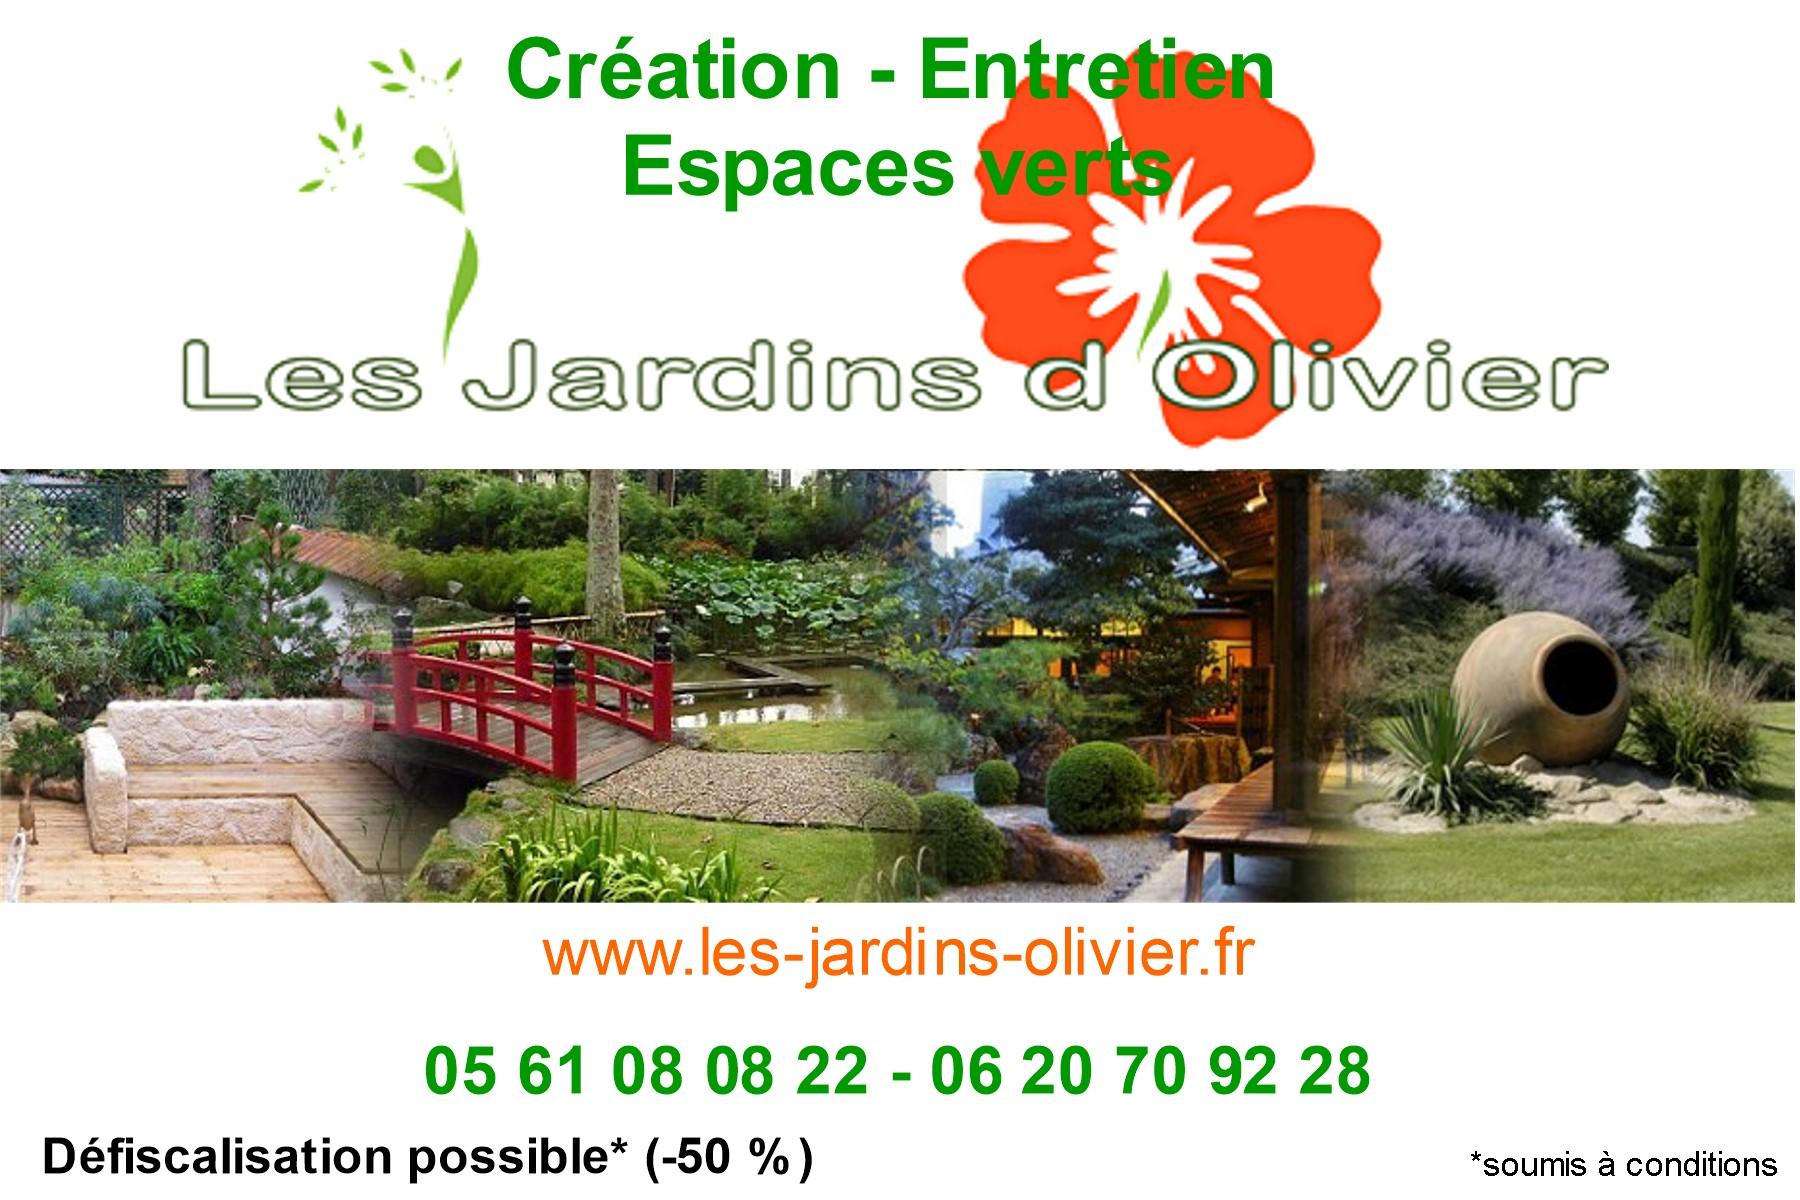 les jardins d olivier id es d 39 images la maison. Black Bedroom Furniture Sets. Home Design Ideas